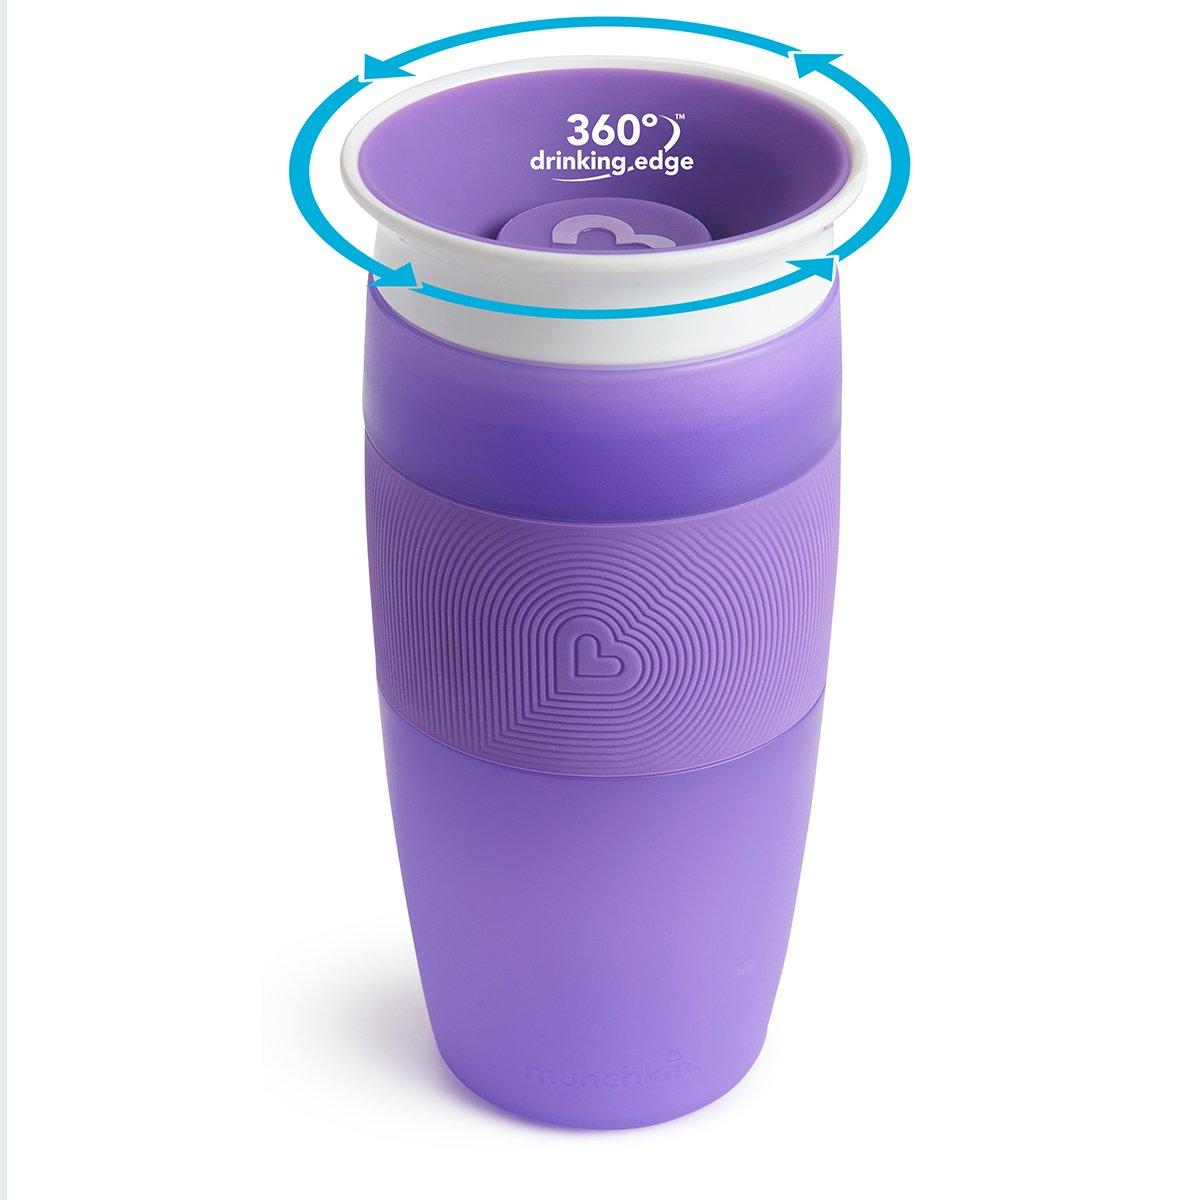 Munchkin Miracle 360ᵒ Trinkbecher ab 18 Monaten auslaufsicher violett 414 ml